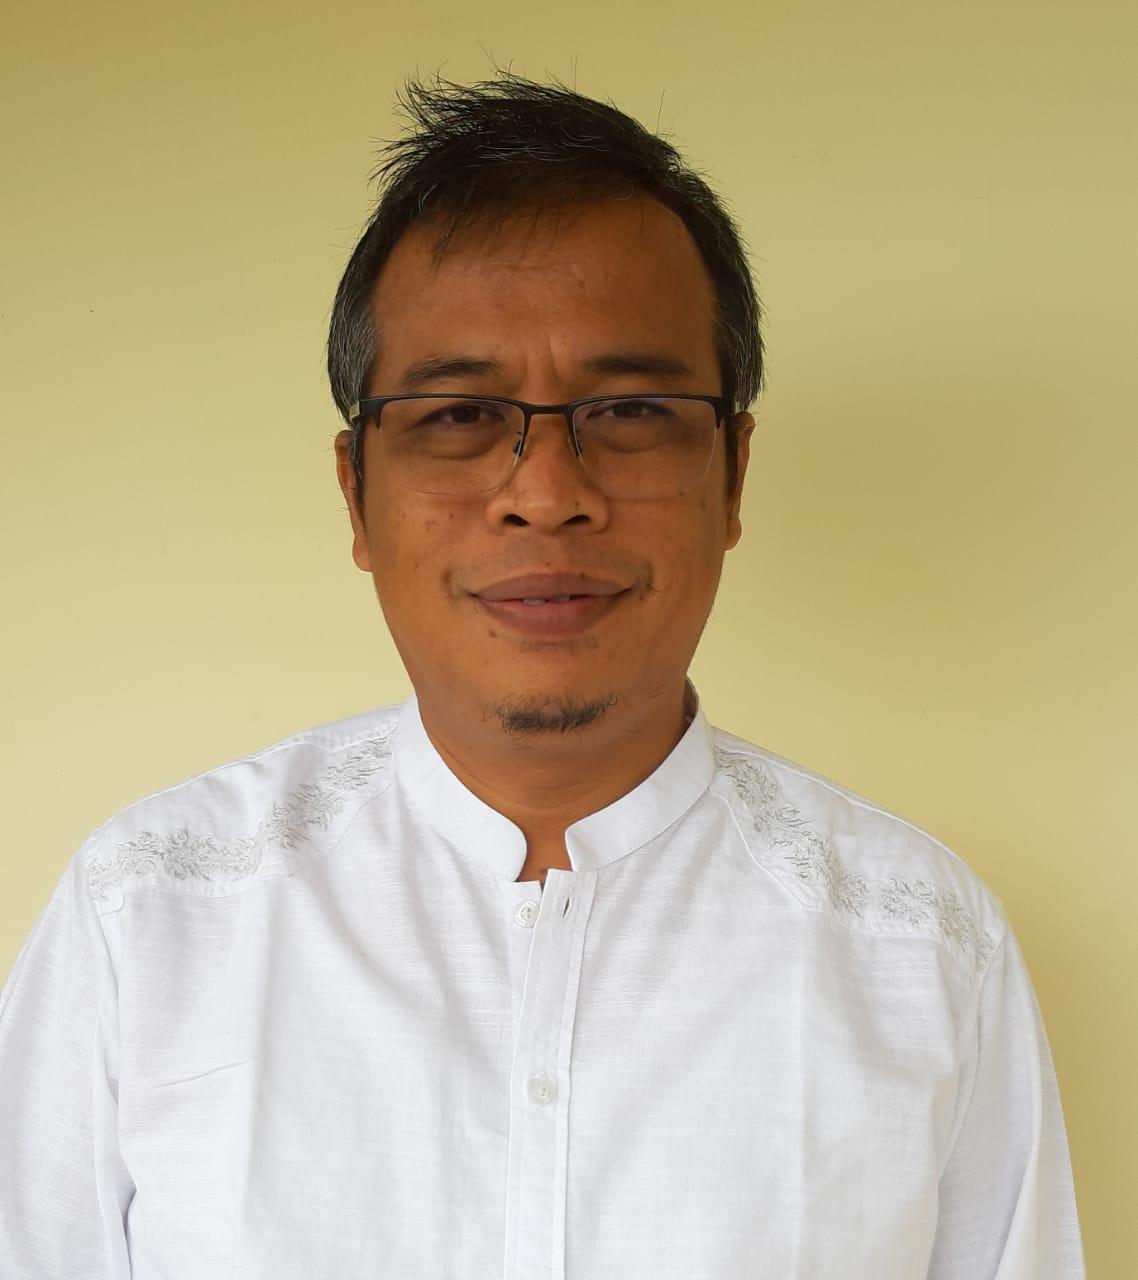 Pengamat Sosial dari Universitas Sebelas Maret (UNS) Surakarta, Nurhadi